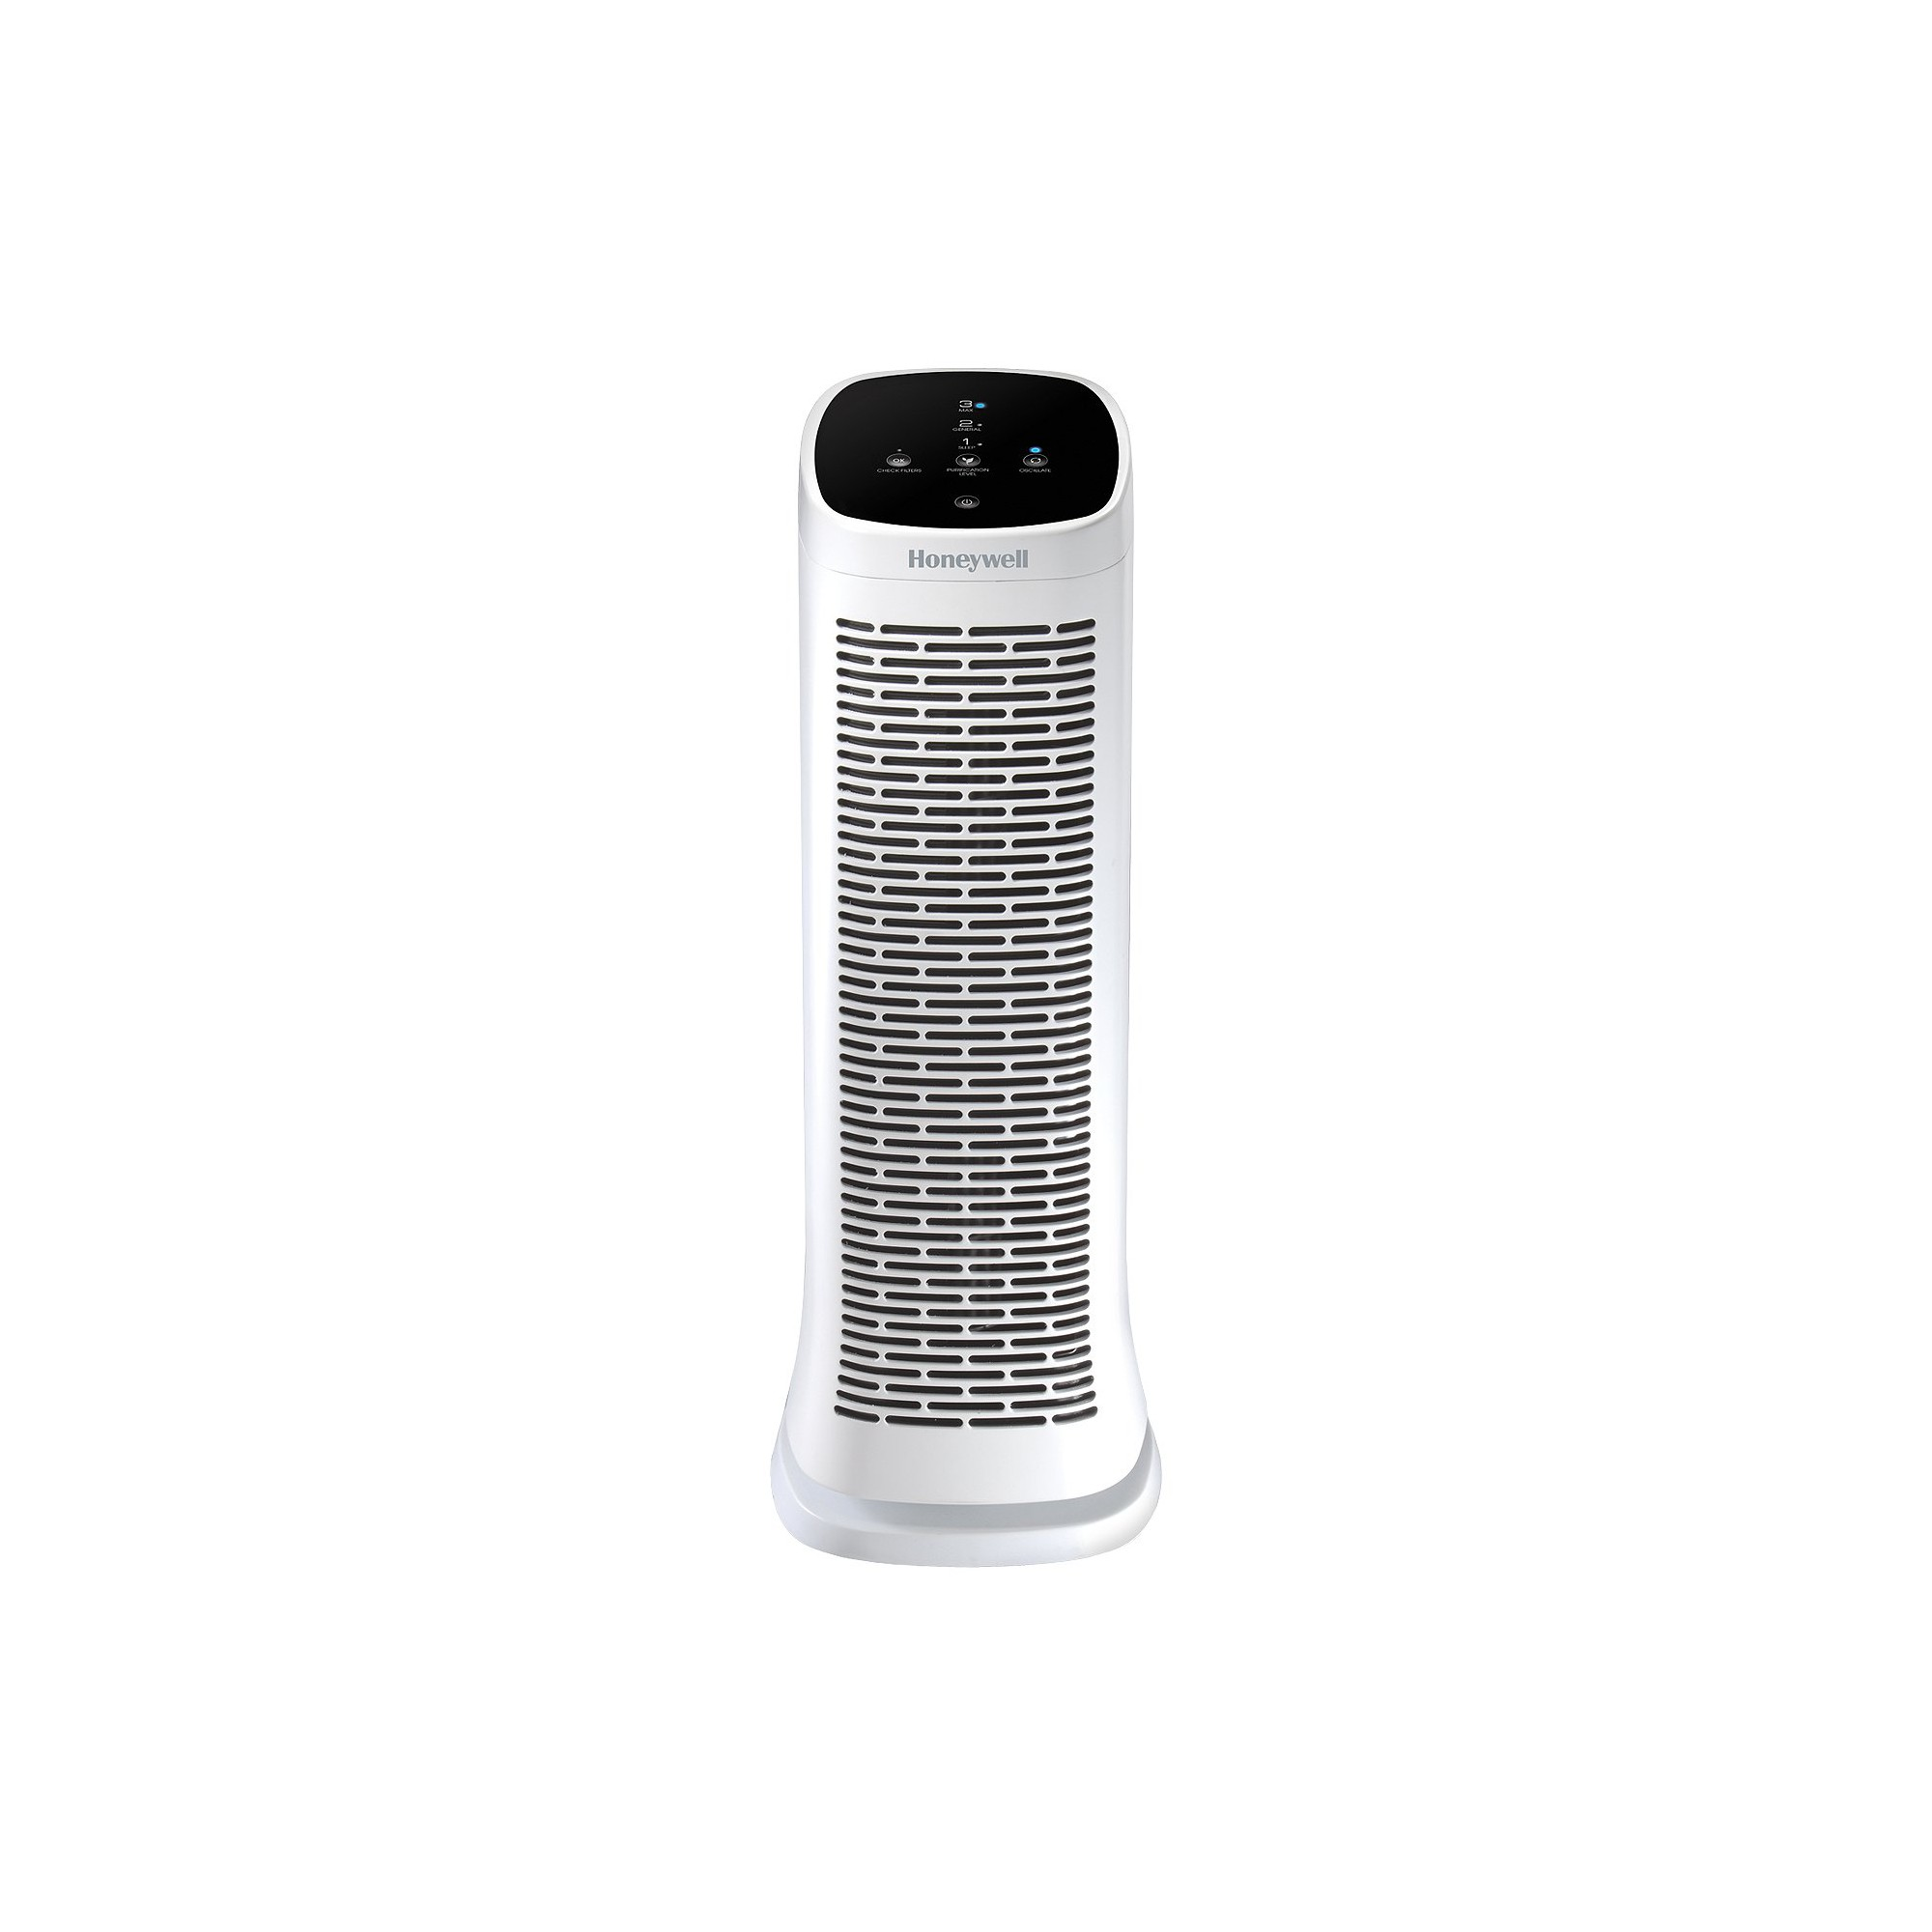 Honeywell AirGenius 3 Air Cleaner/Odor Reducer Hfd300